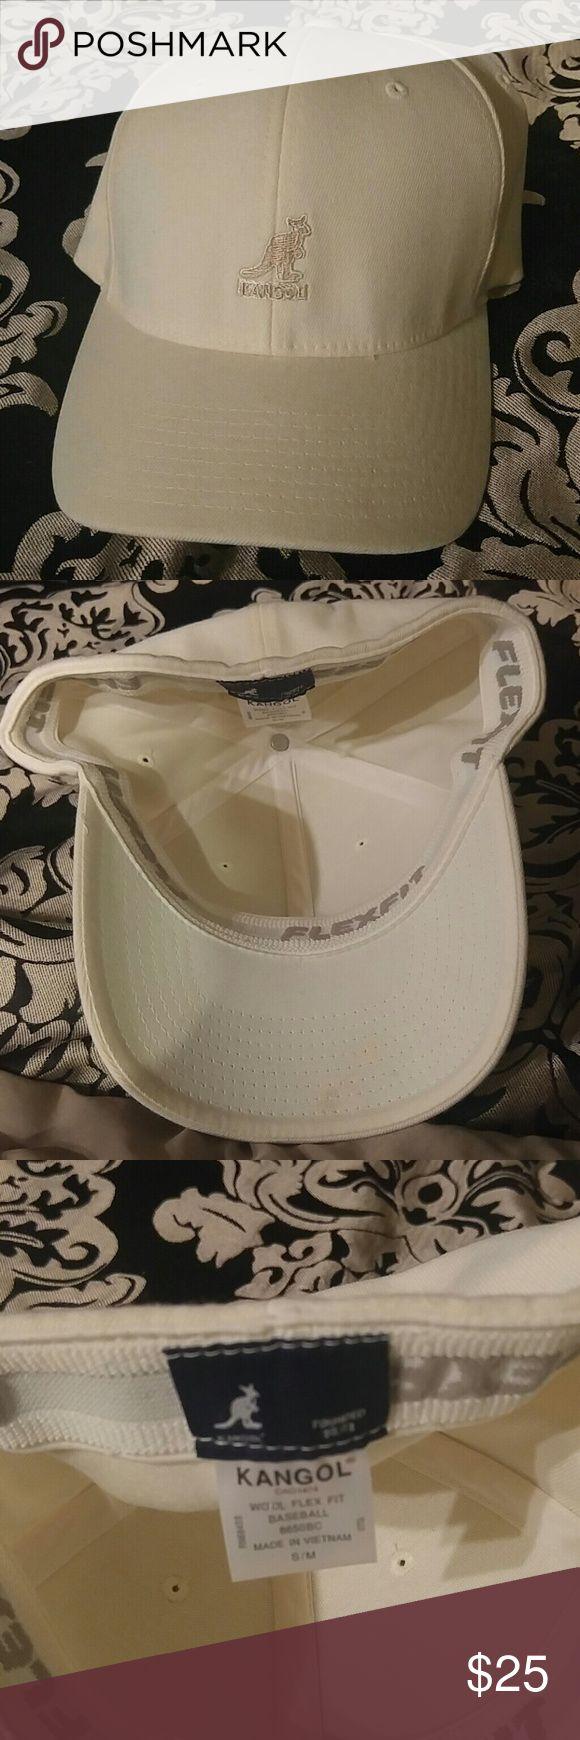 NWOT KANGOL BASBALL CAP SZ S/M CREAM COLOR NEW STORAGE KEPT Kangol Accessories Hats